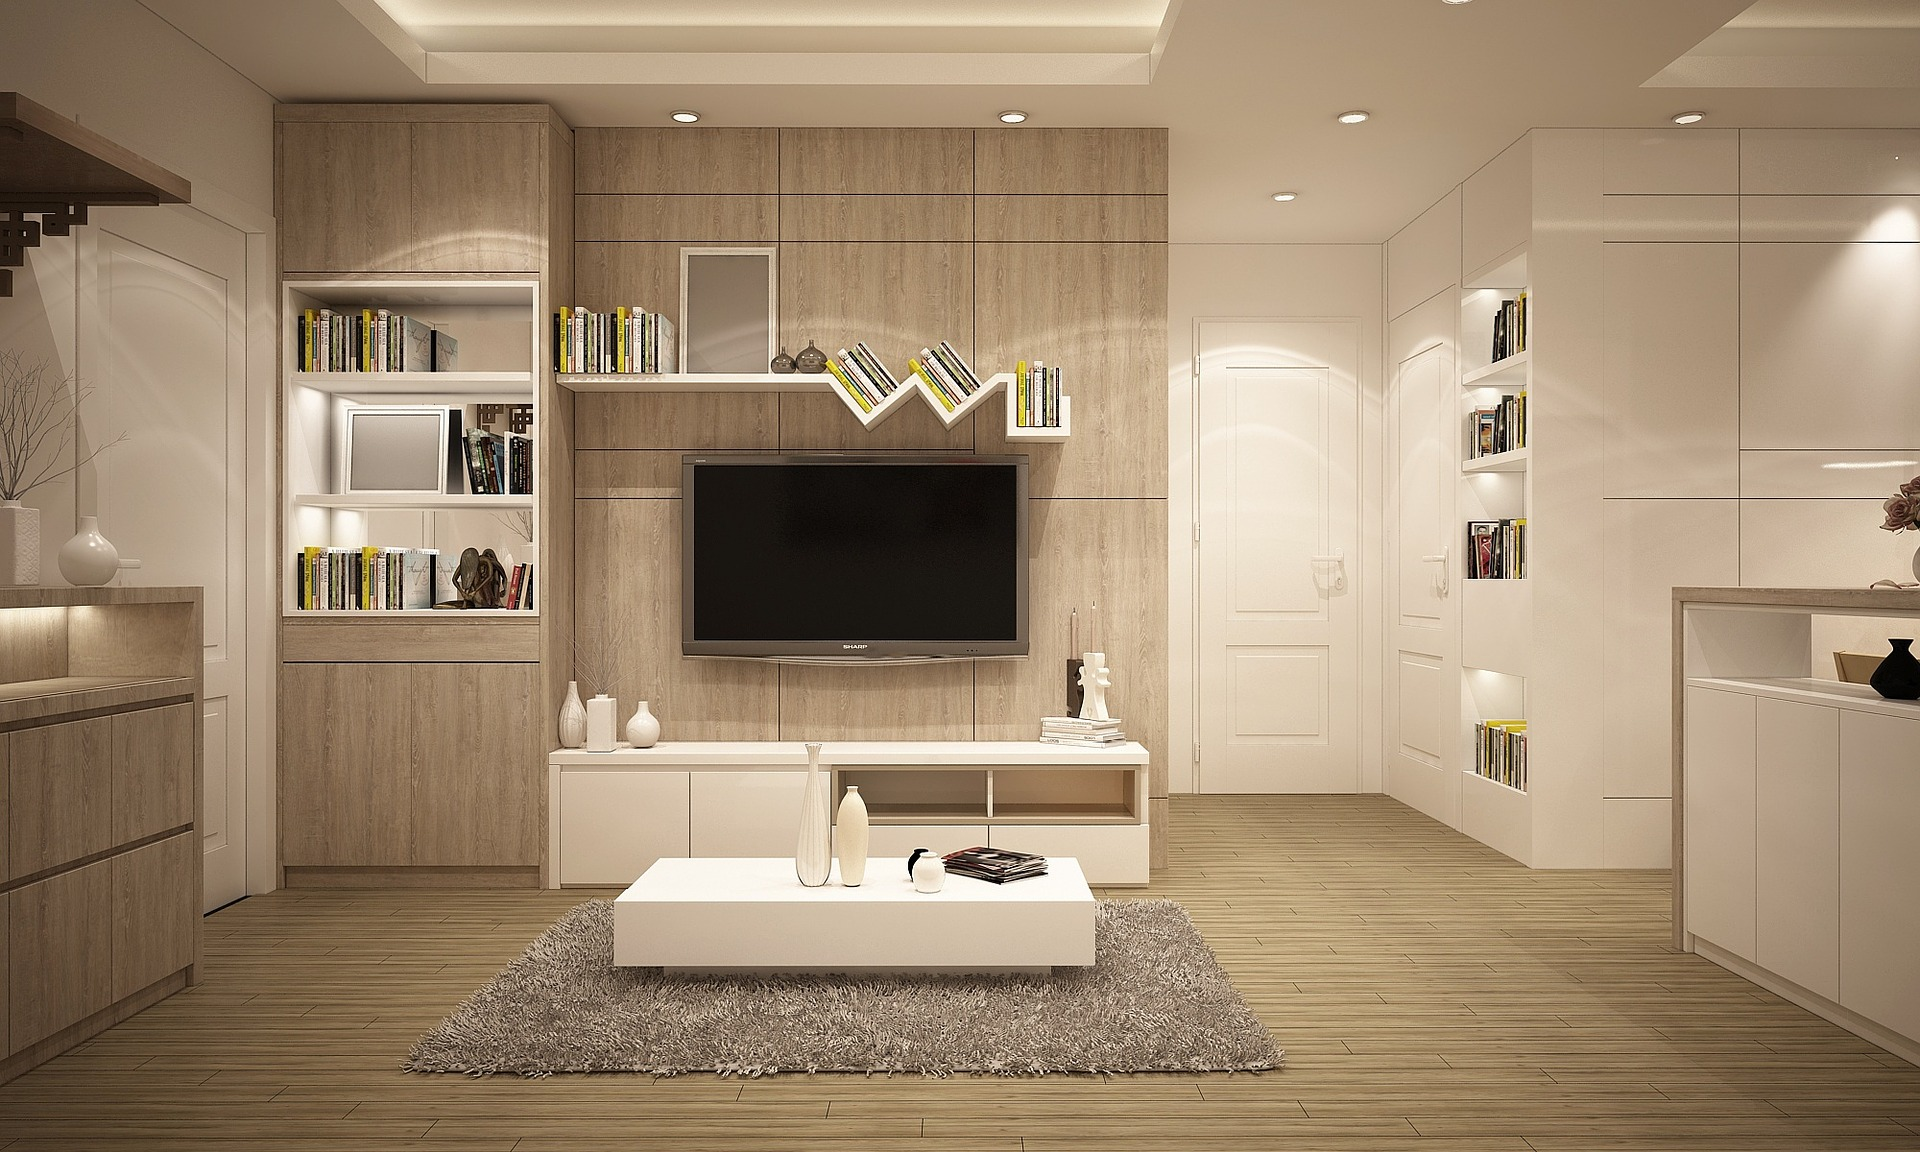 Resurfaçage d'armoire en bois